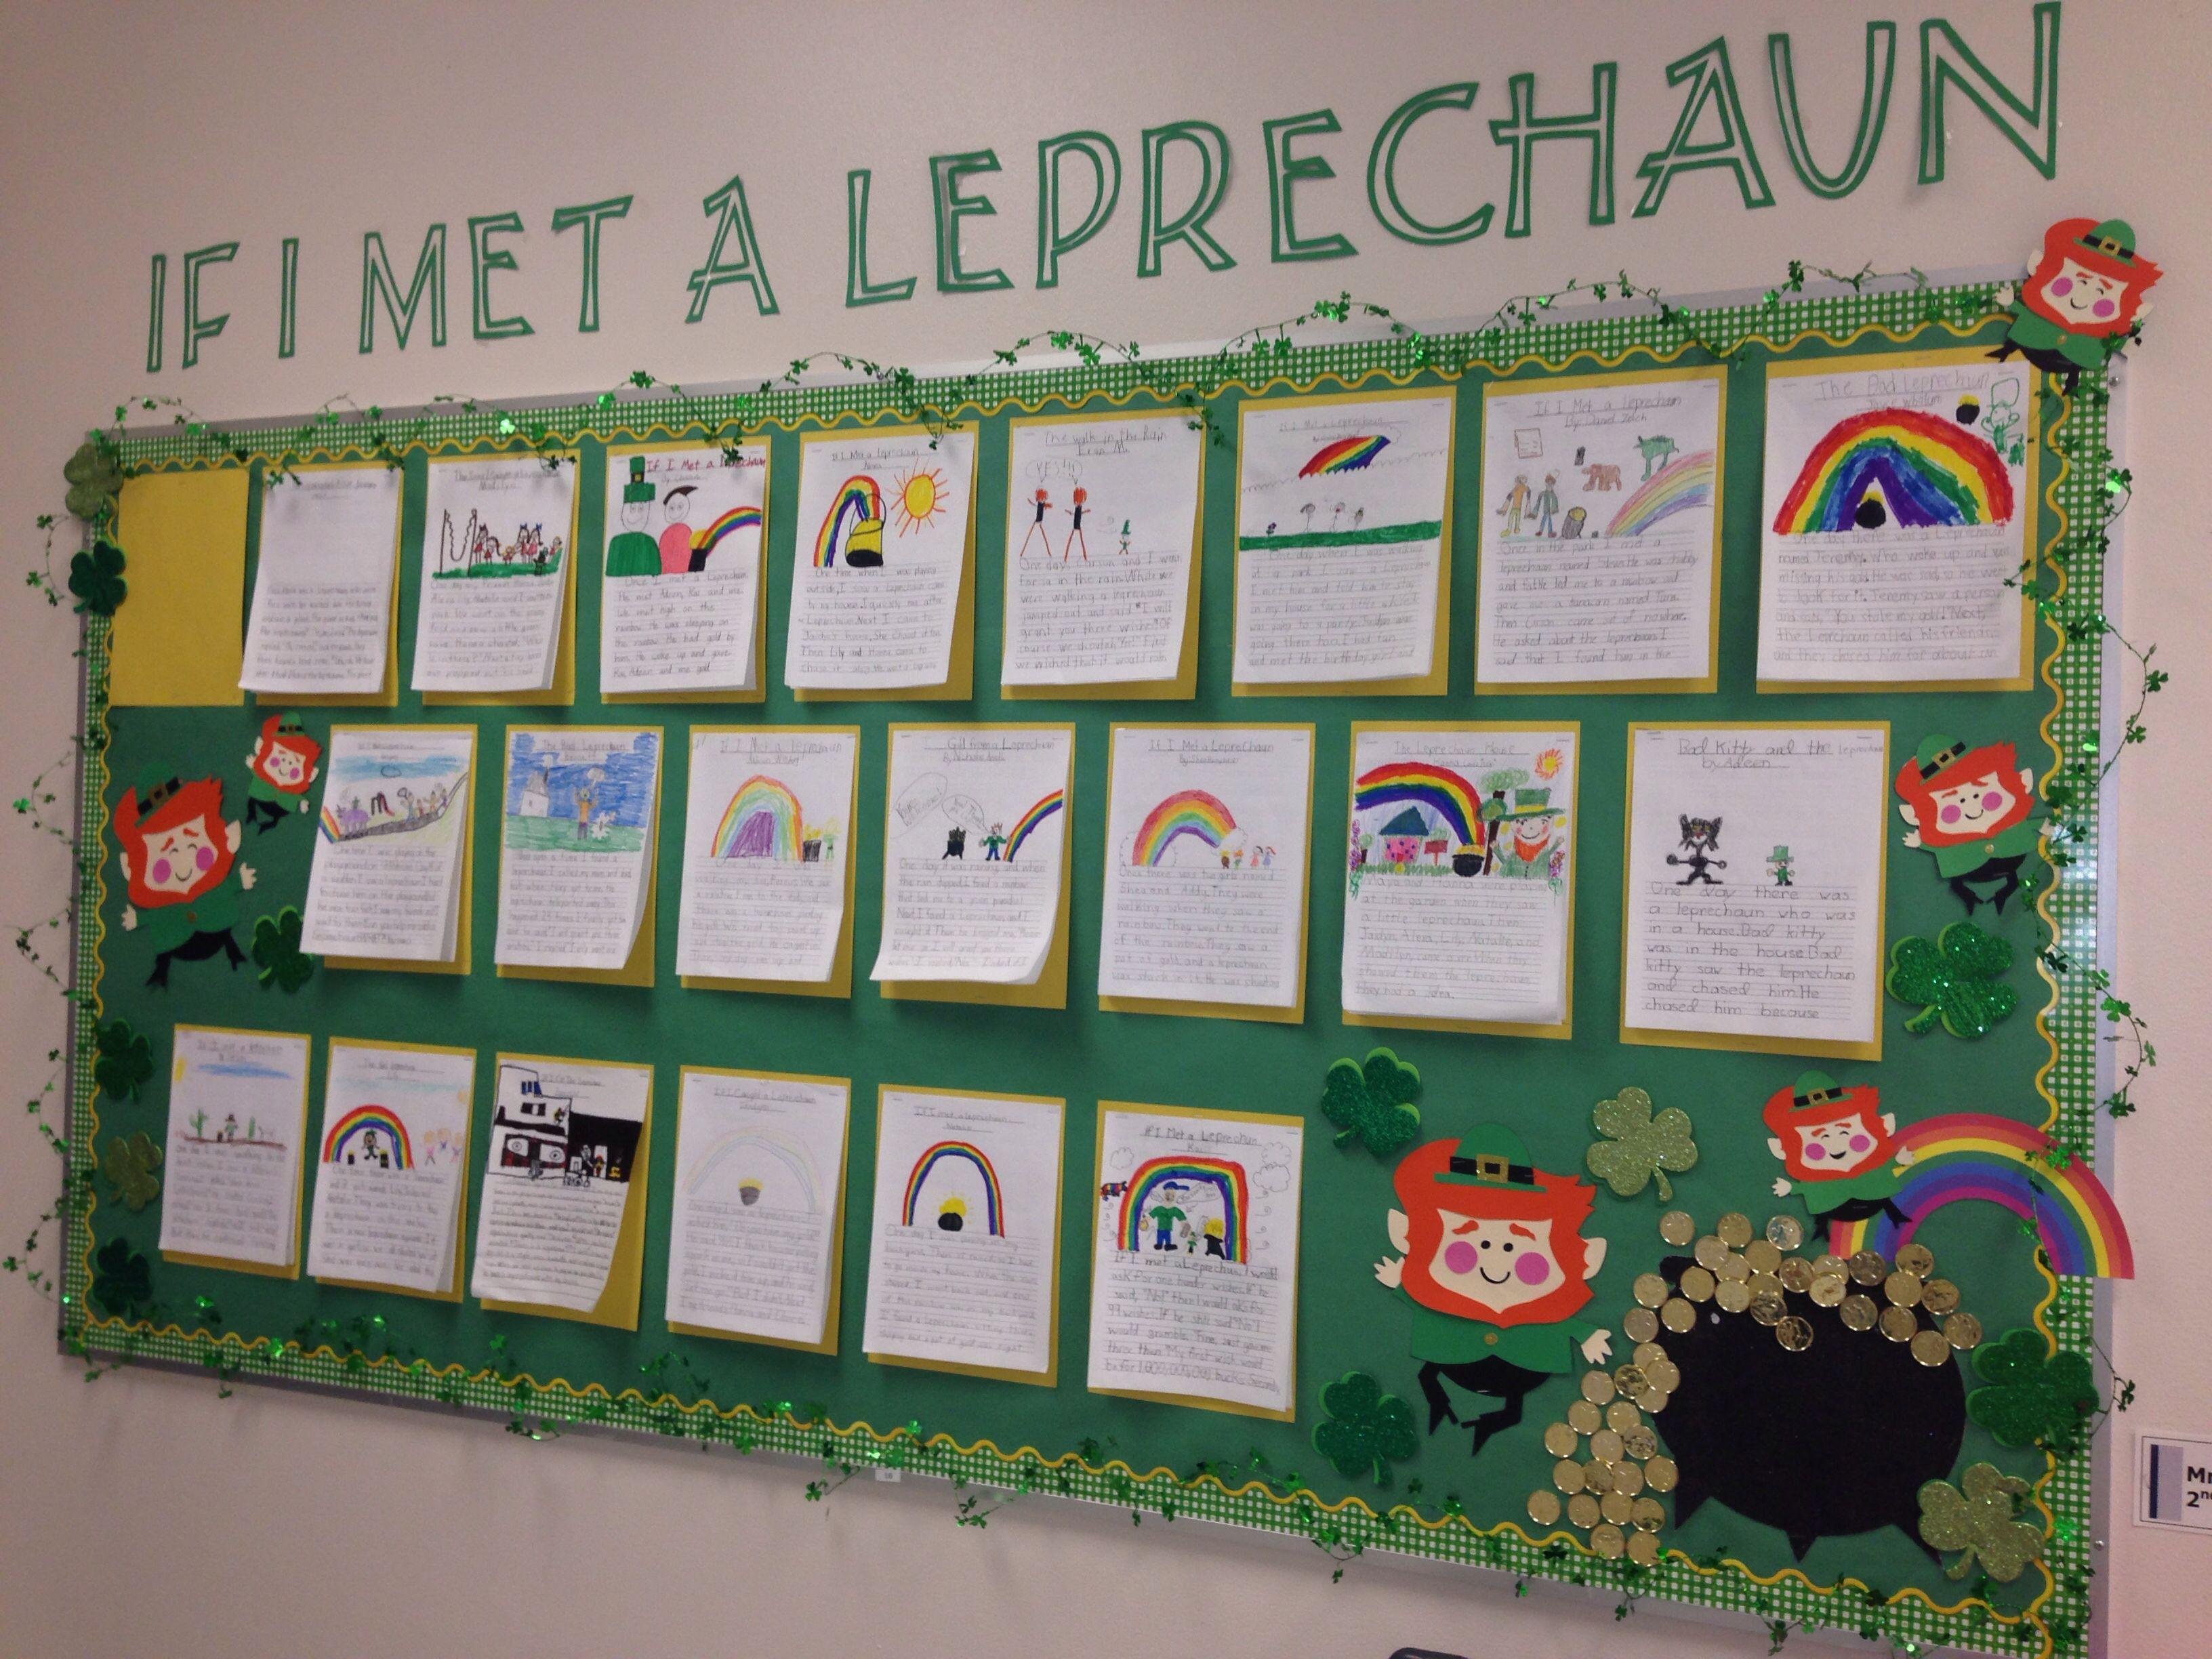 St Patrick S Day Bulletin Board If I Met A Leprechaun